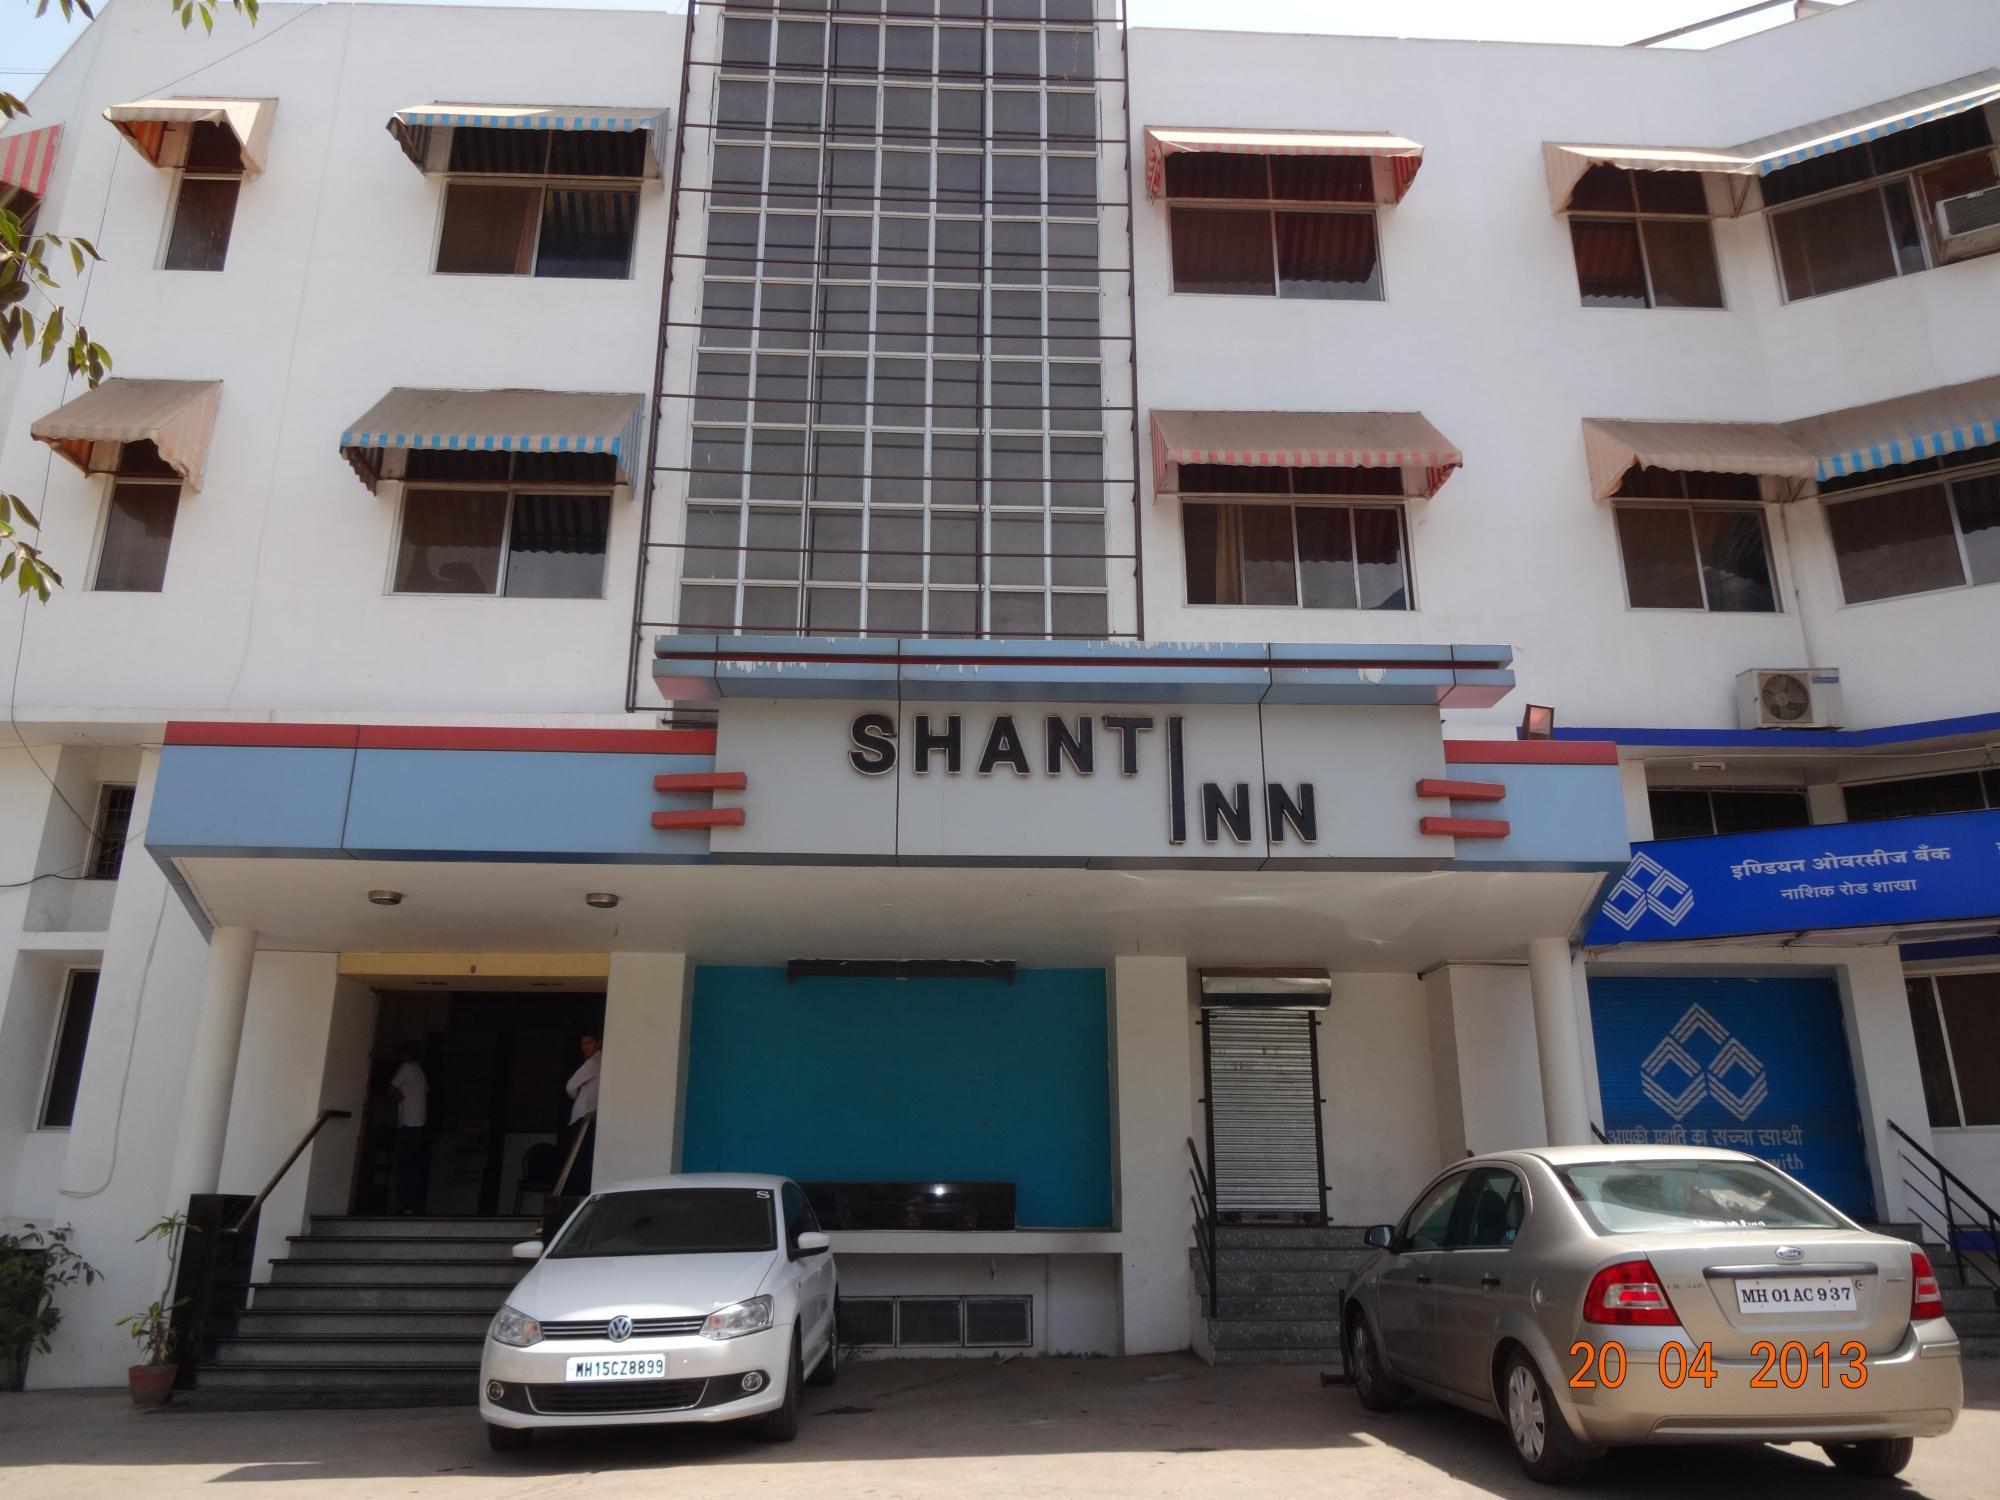 Shanti Inn - Sakhla Arcade - Nashik Image